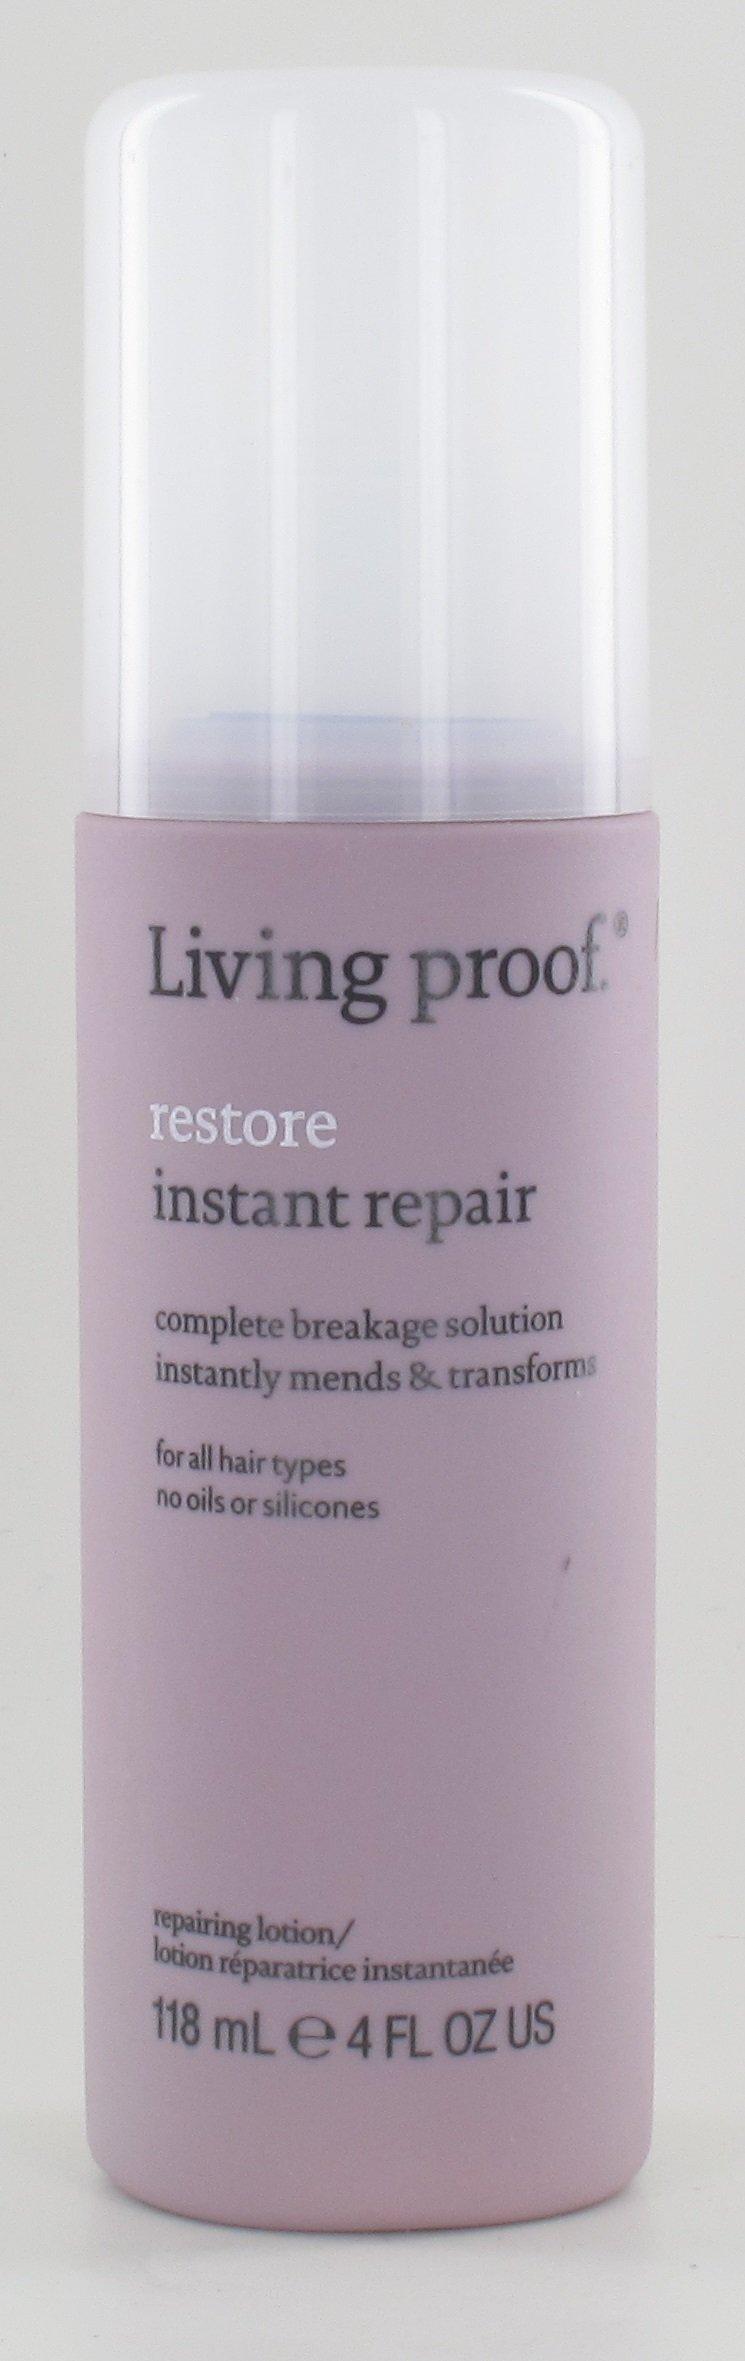 Living Proof Restore Instant Repair 4oz